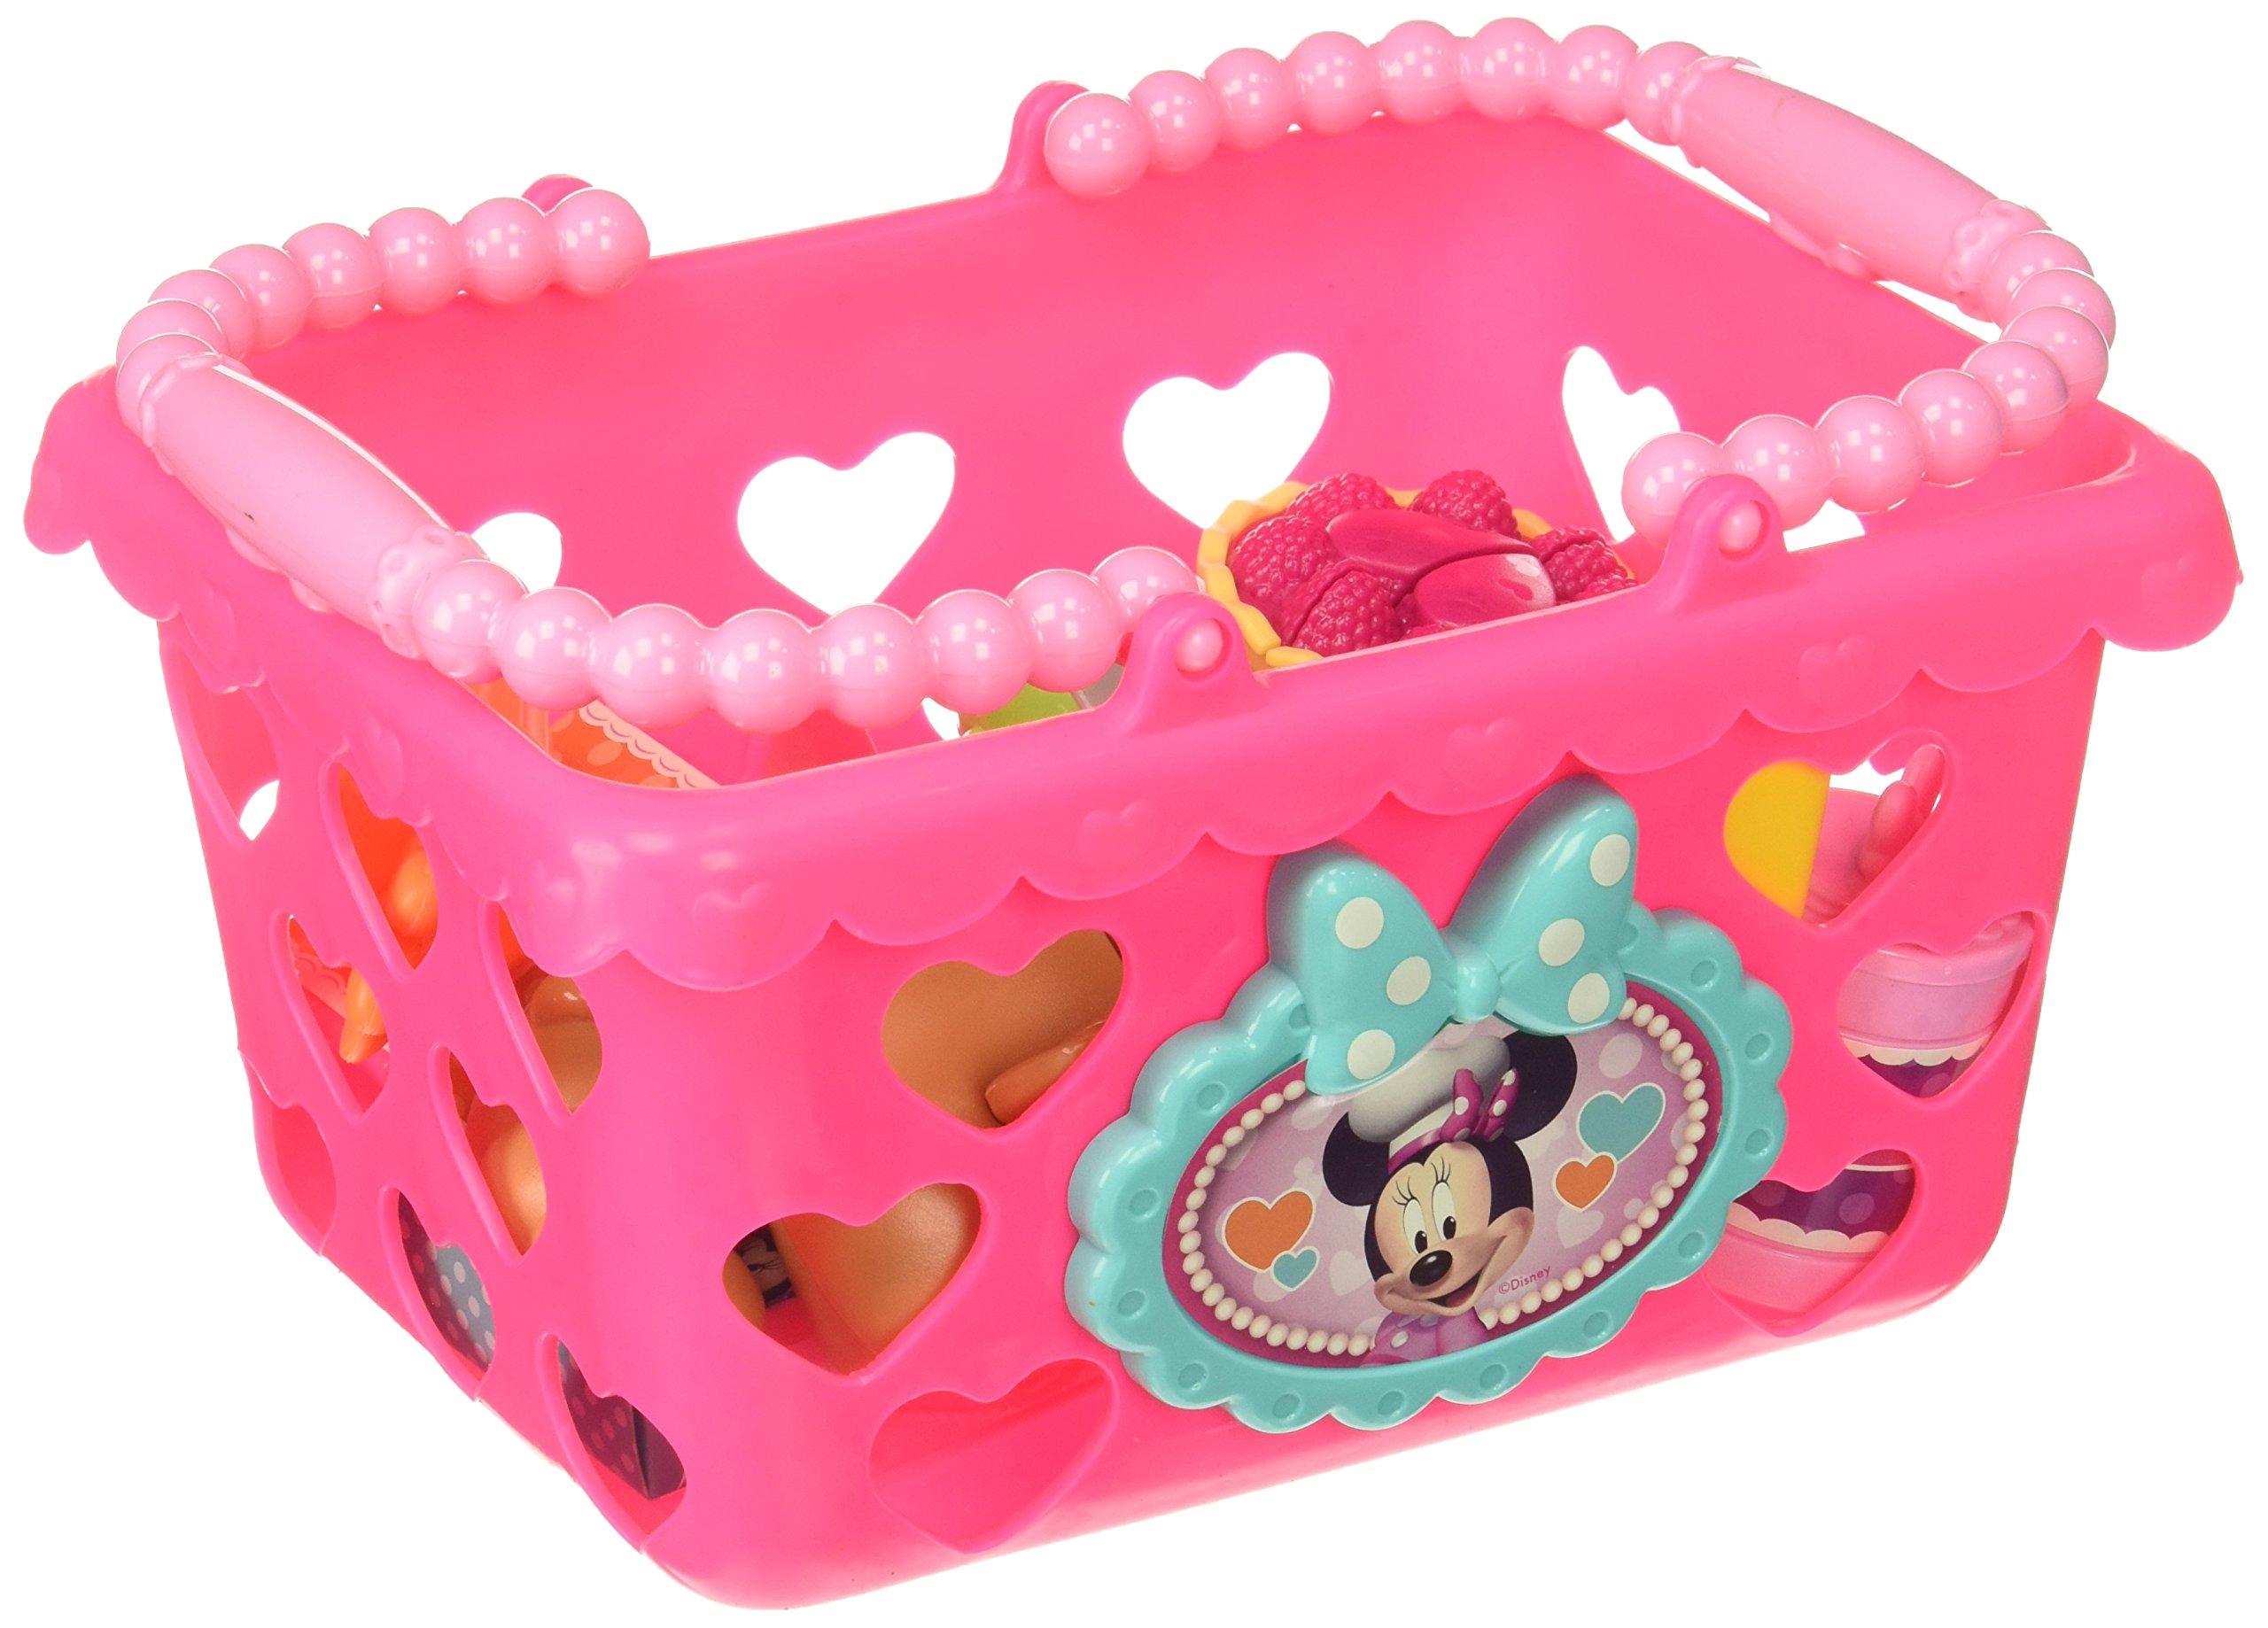 Minnie Mouse Shoptastic Basket Set by Minnie